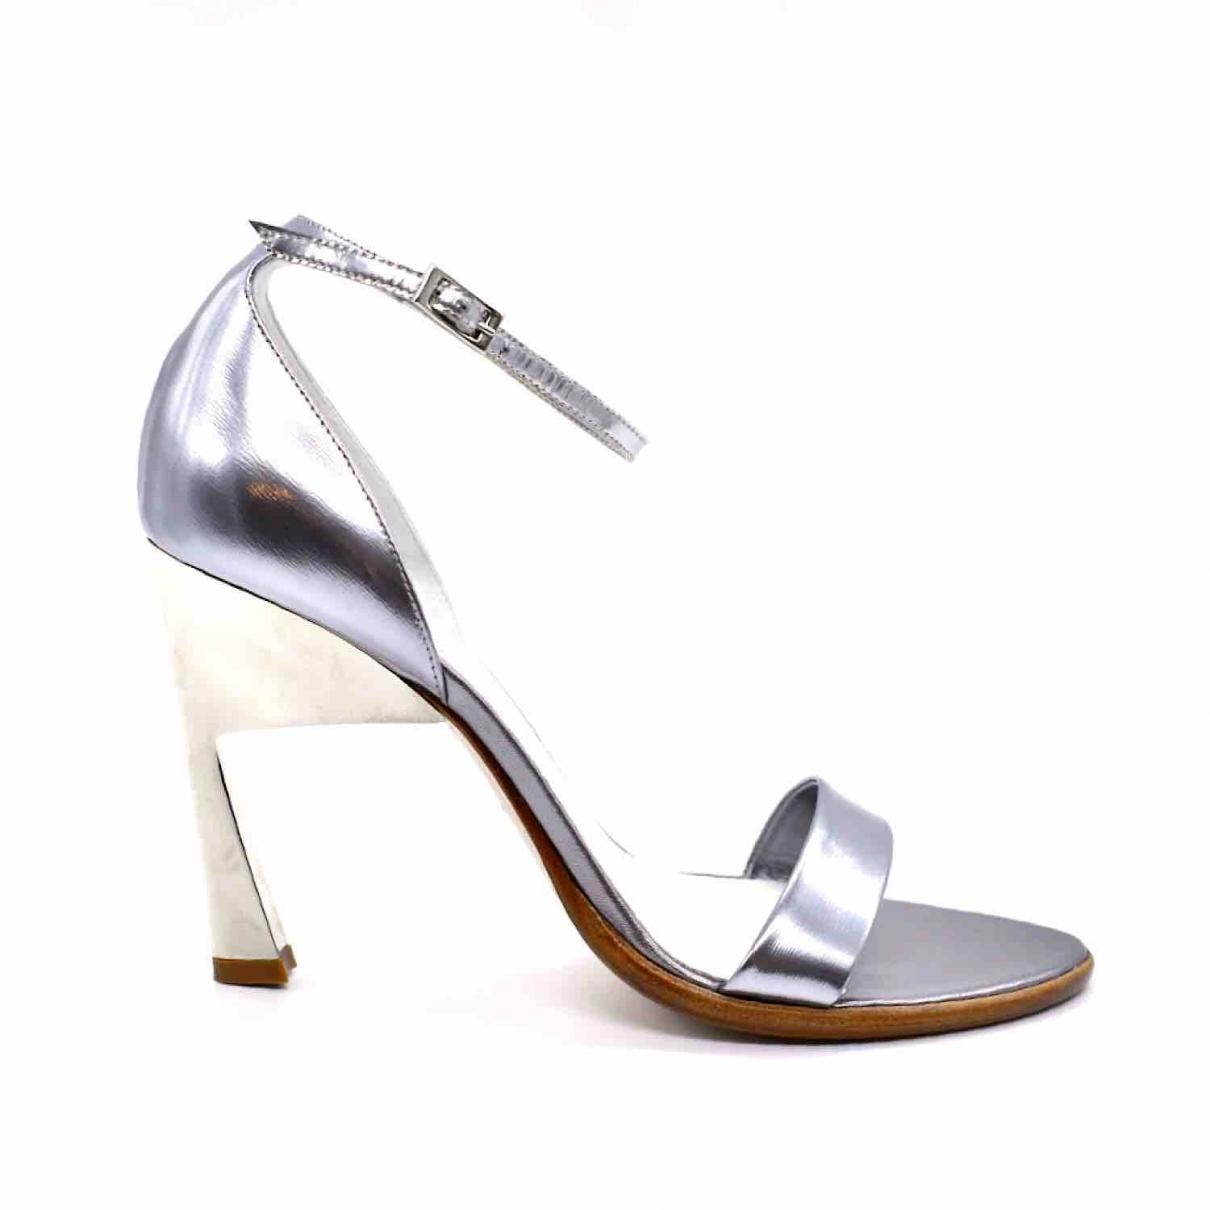 Maison Martin Margiela \N Silver Leather Sandals for Women 41 EU